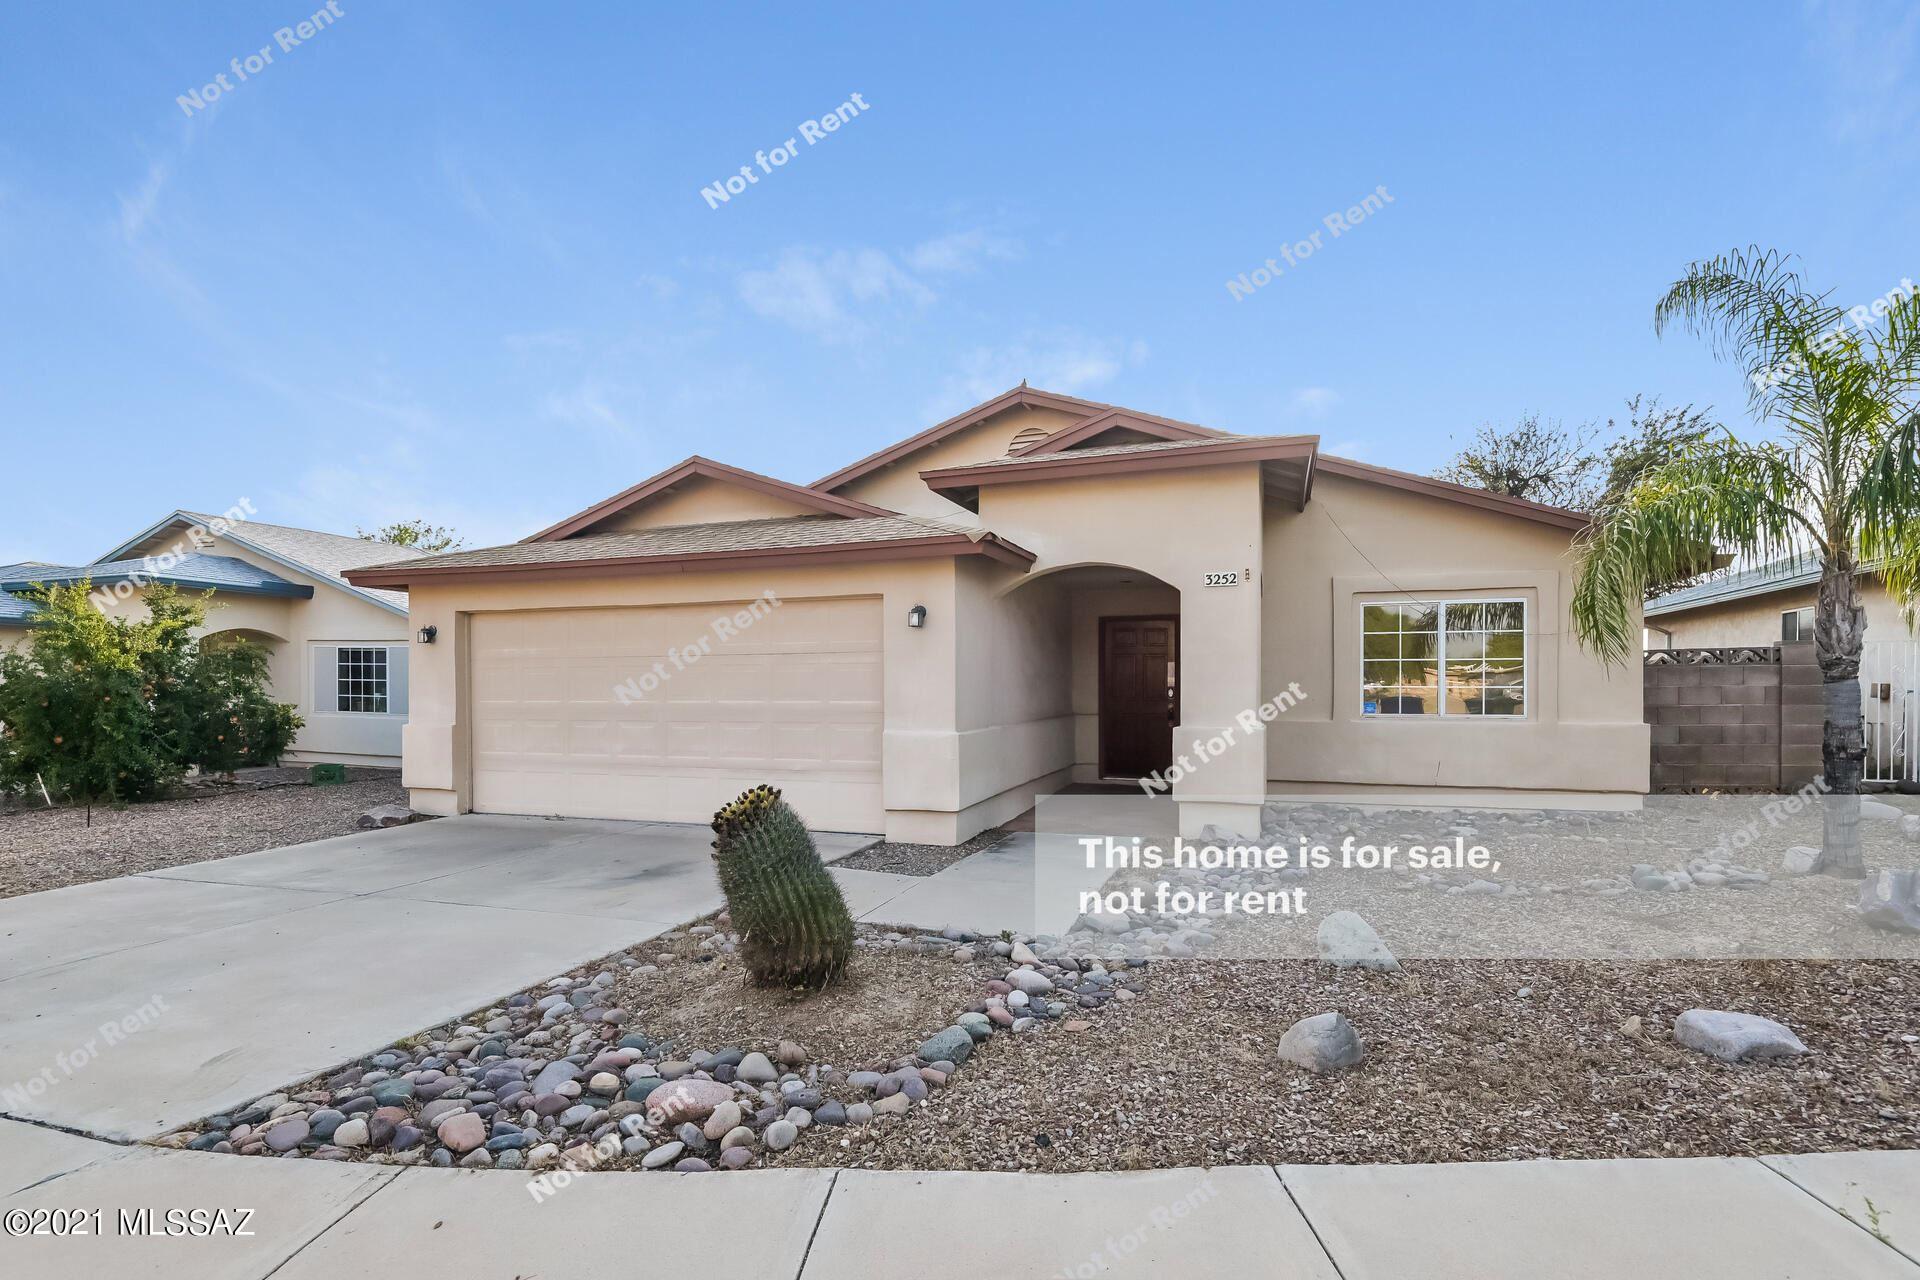 3252 S Kristina Park Loop, Tucson, AZ 85730 - MLS#: 22123431